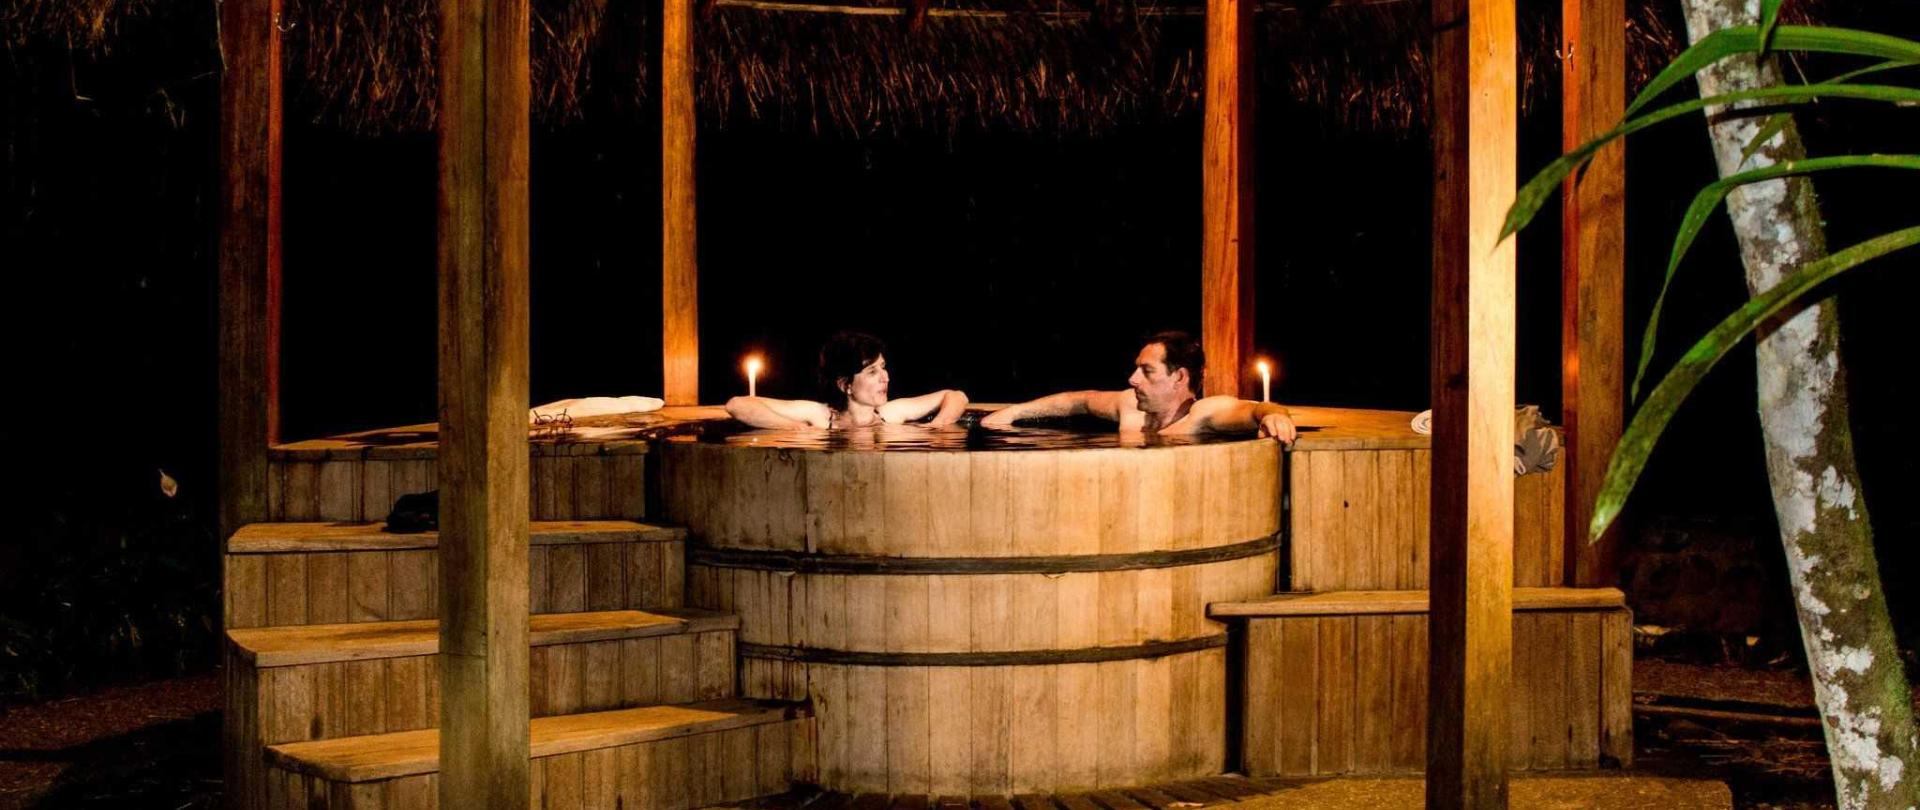 hot-tub-relax.jpg